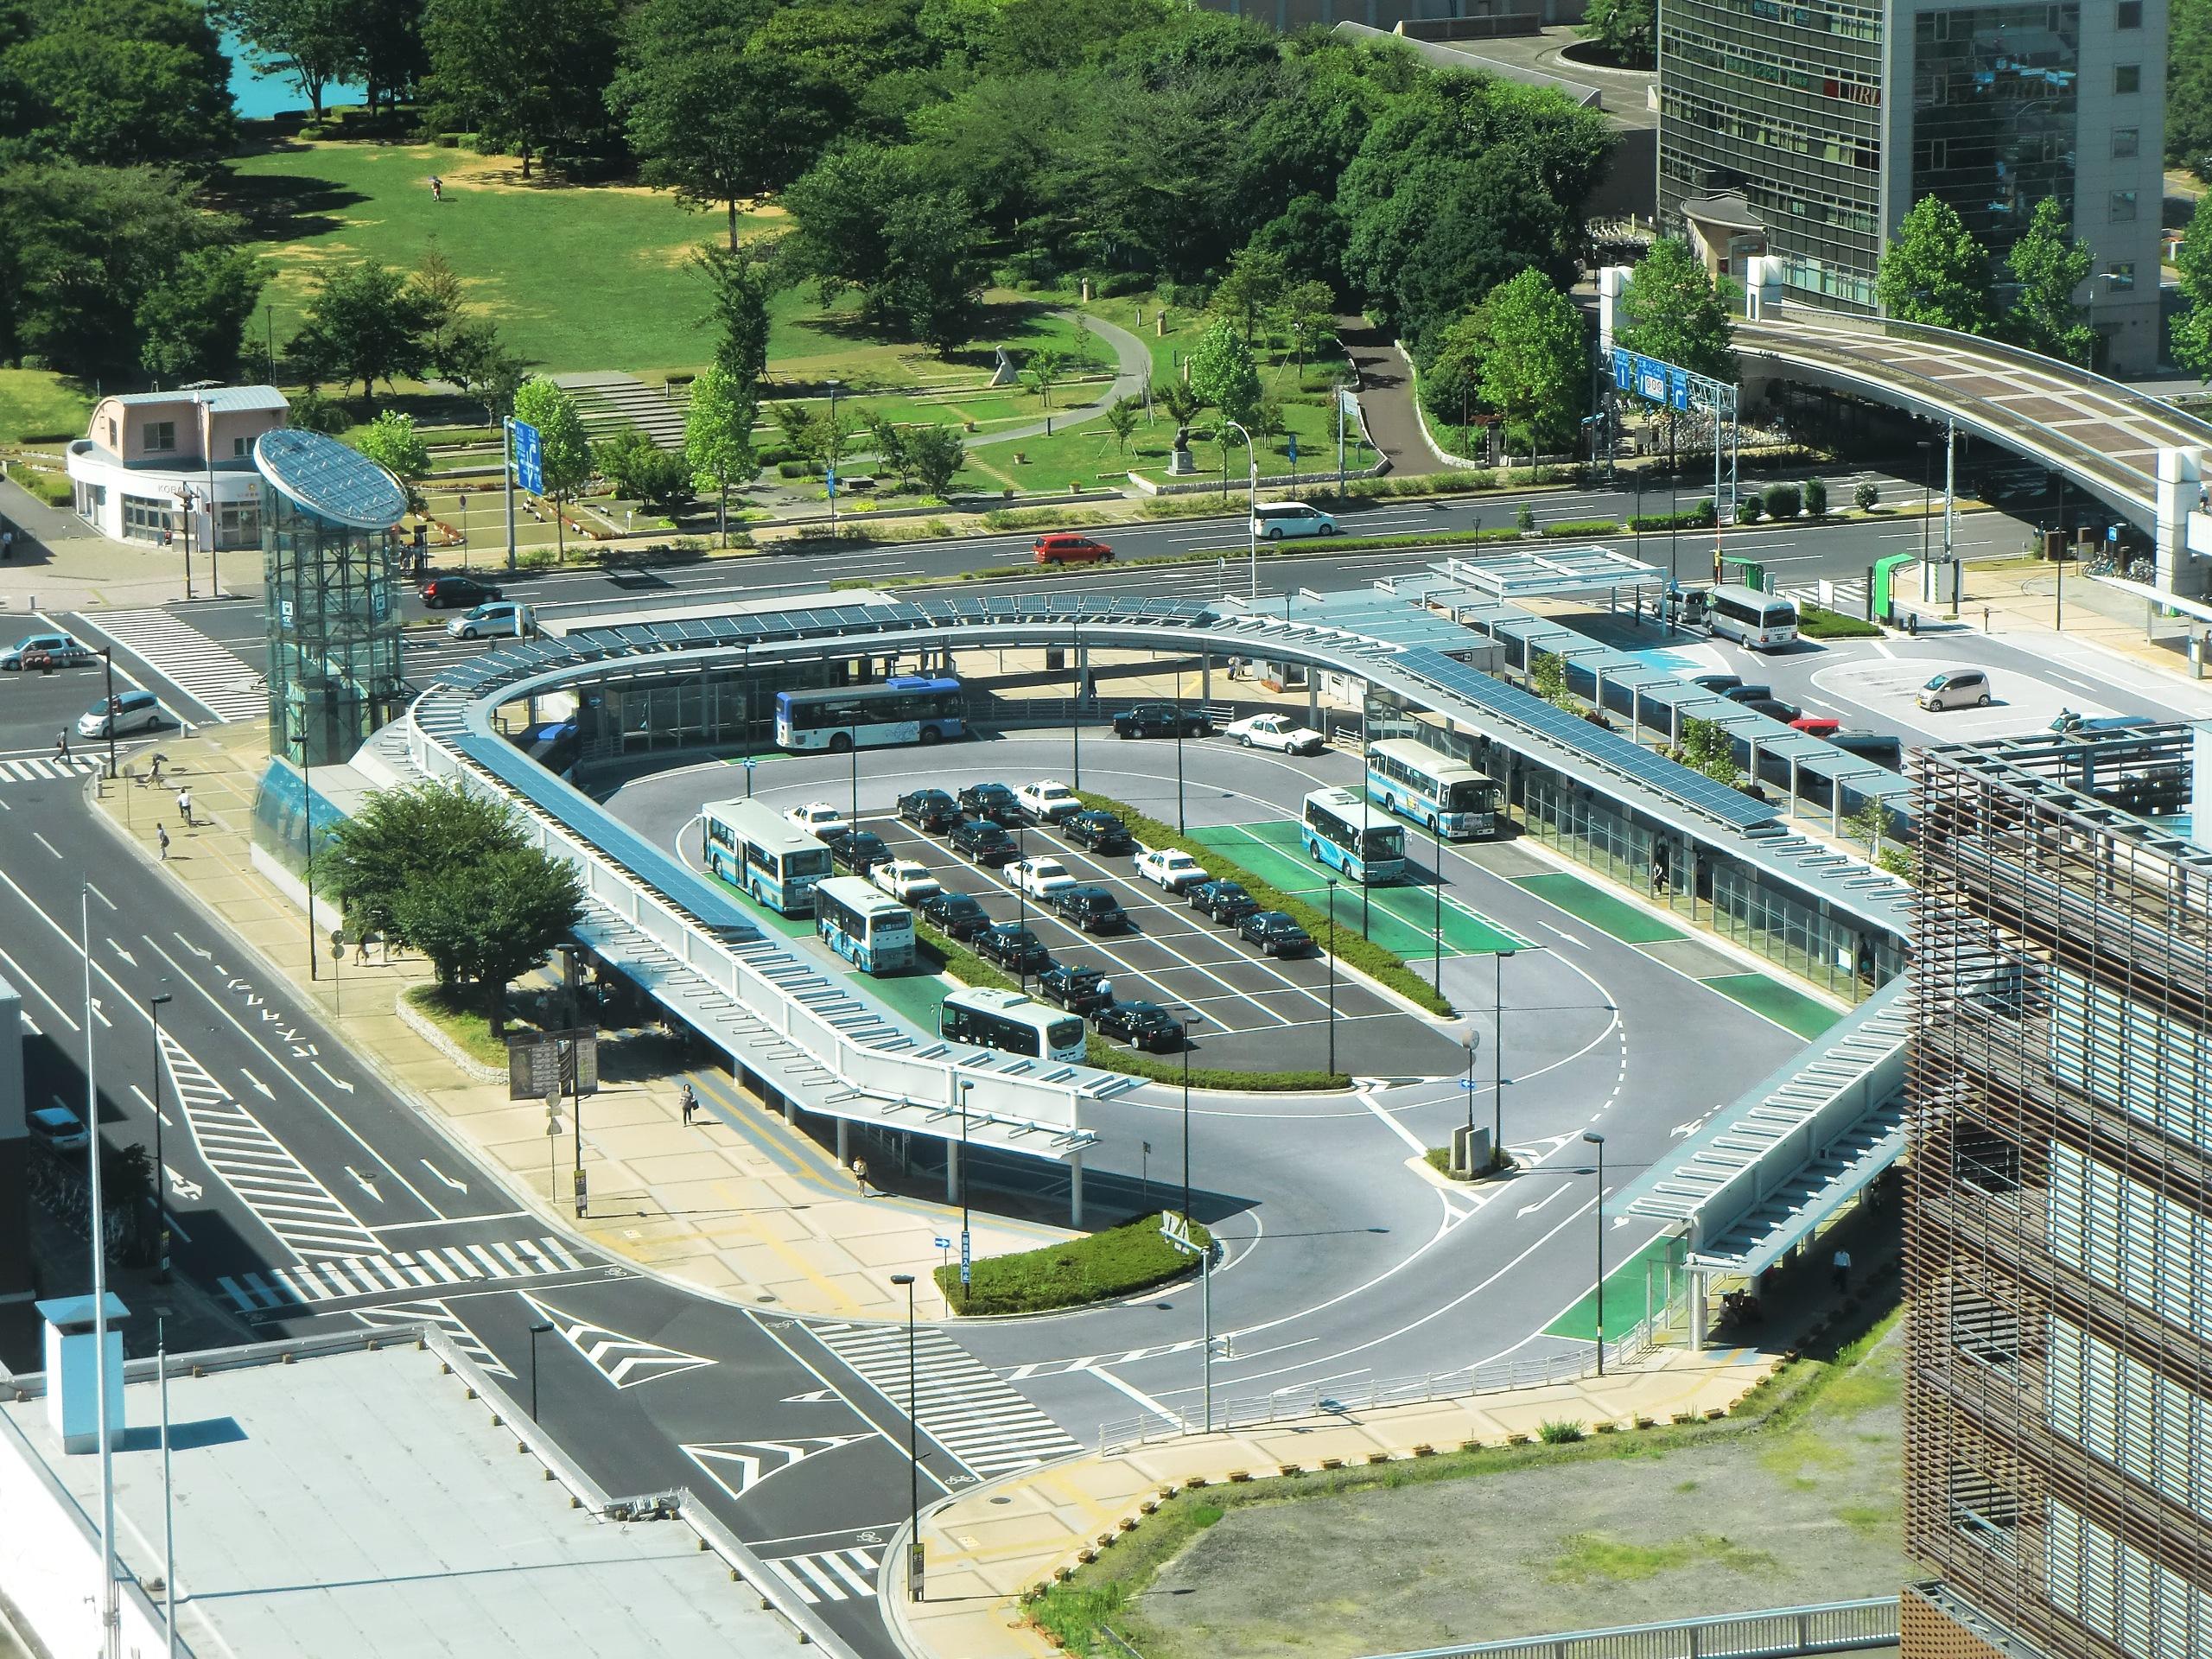 fileview of tsukuba center bus terminal july 2012jpg wikimedia commons